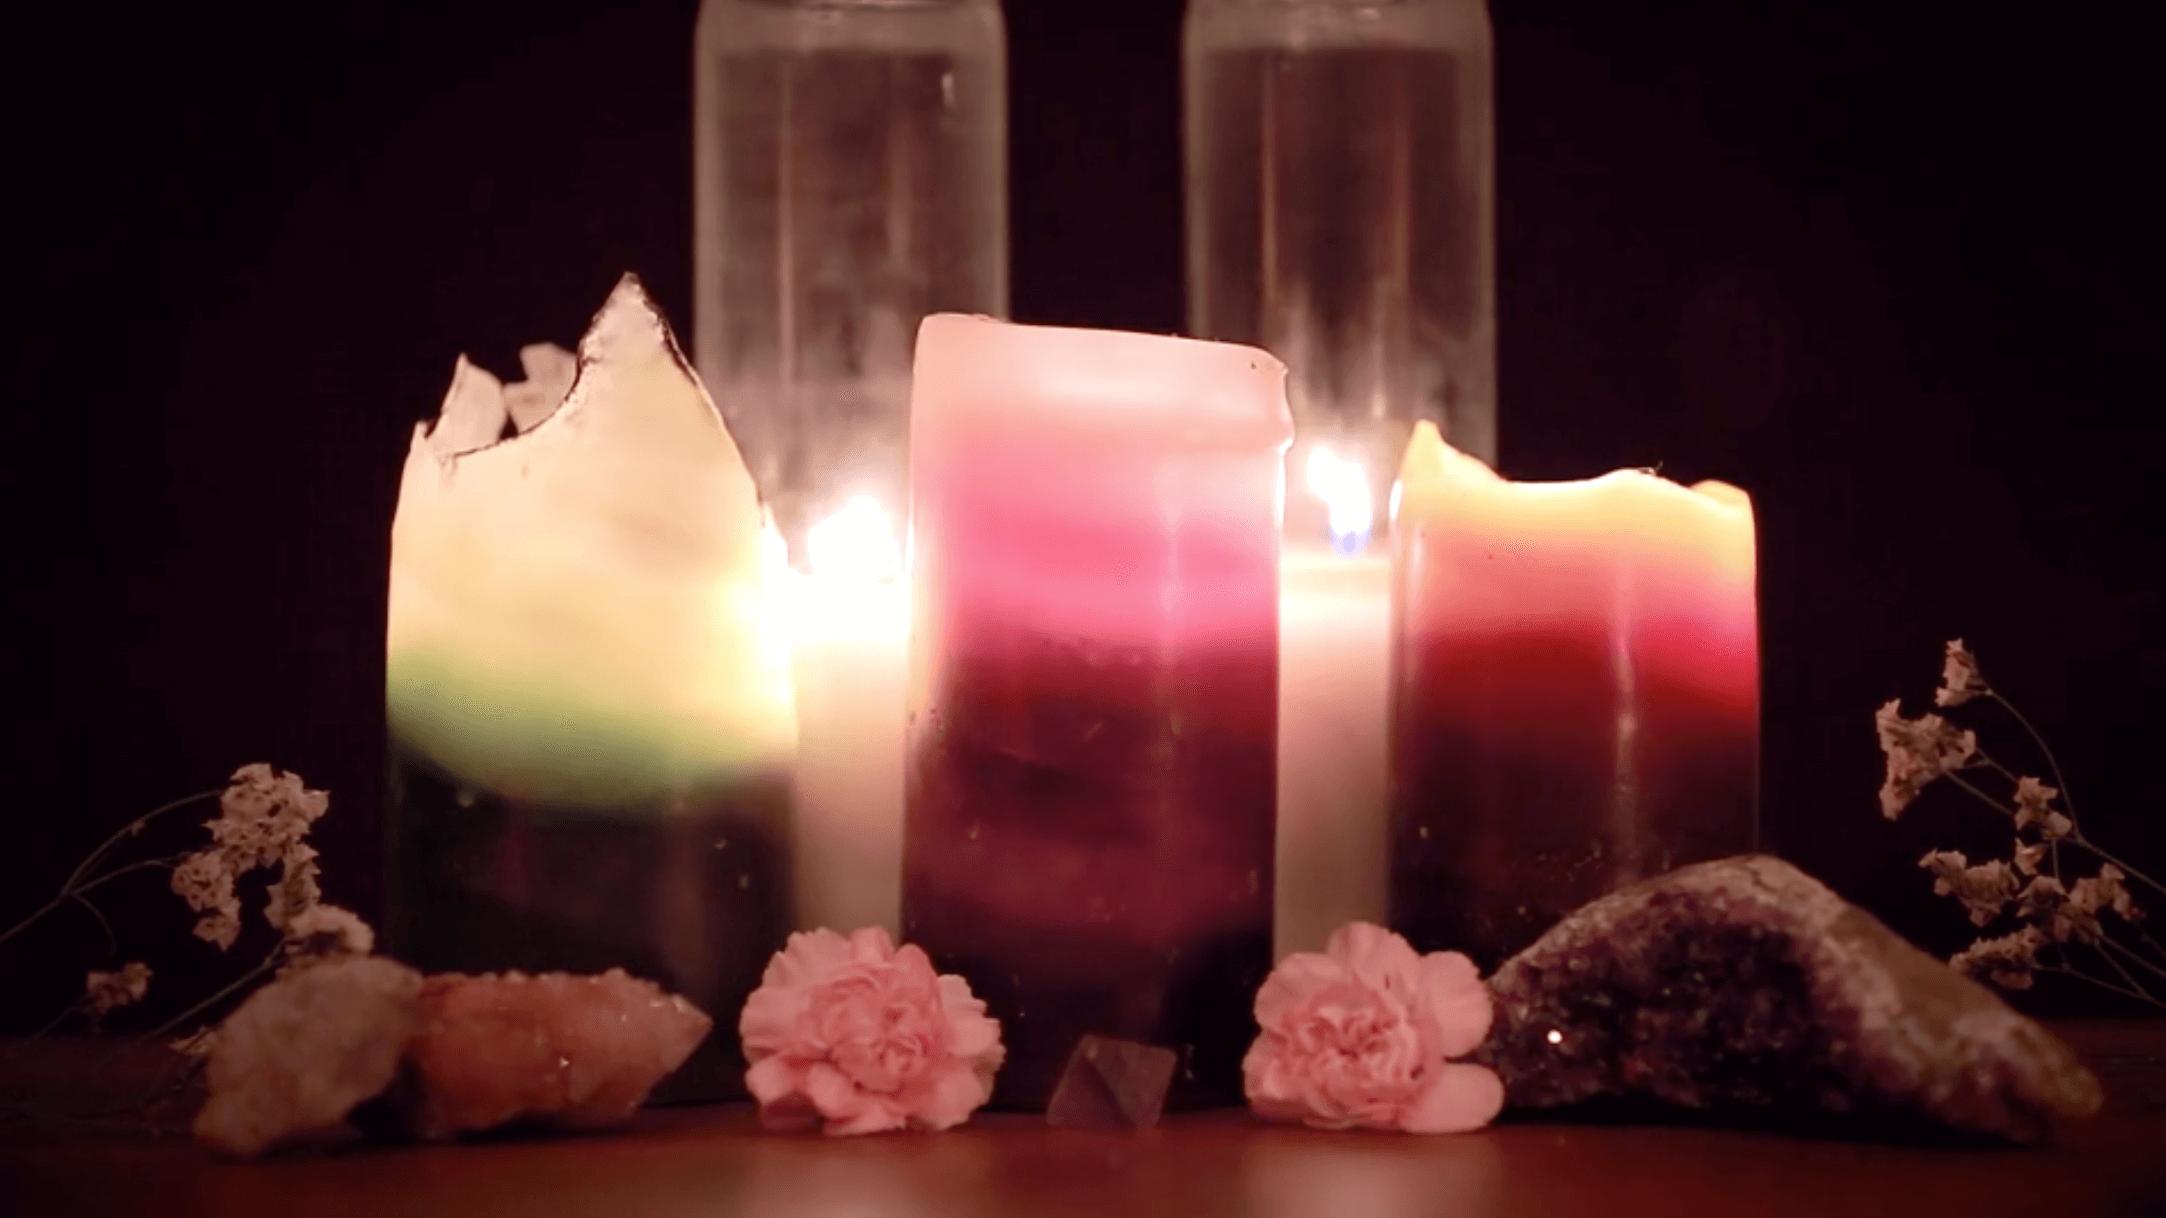 luna-dietrich-candles.png